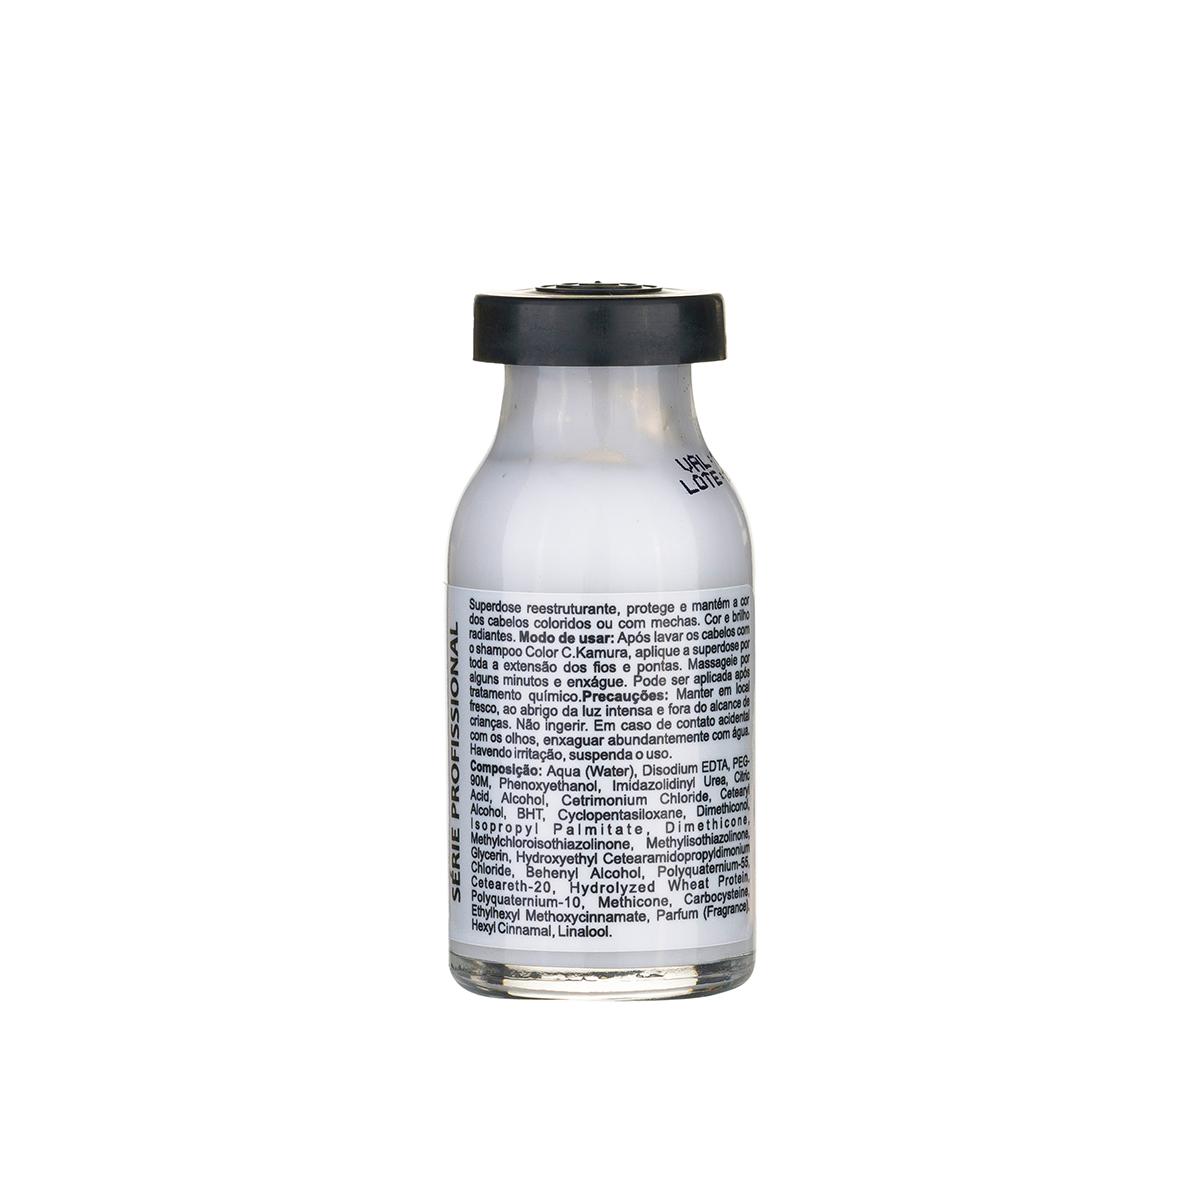 Superdose Reestruturante CKamura Radiant Shine 15Ml